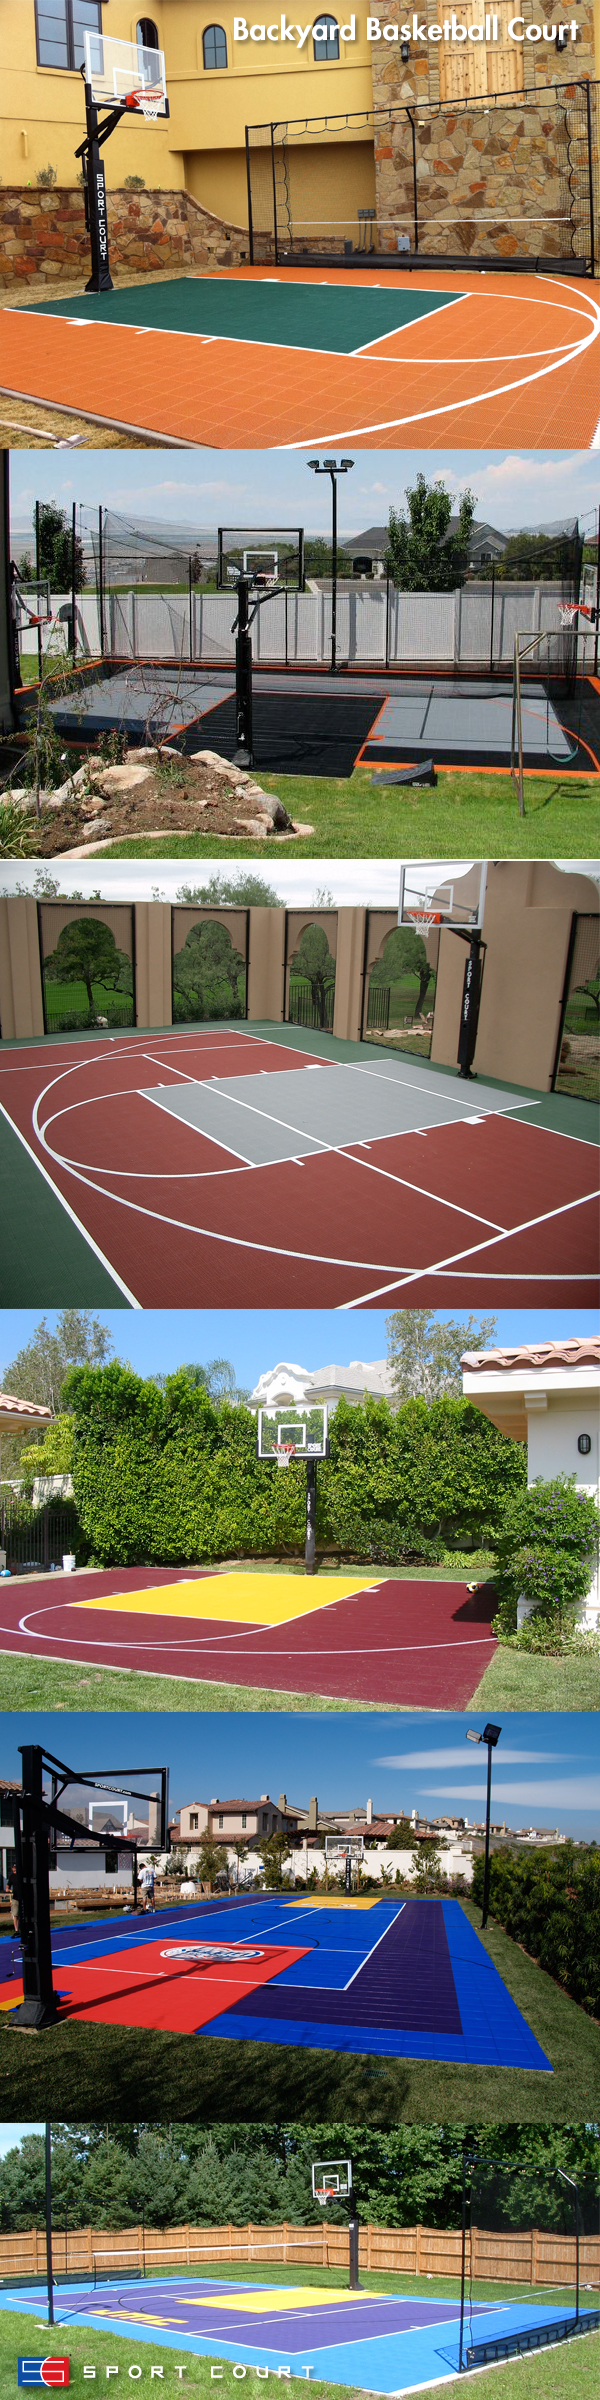 endless hours of family fun sport court backyard basketball